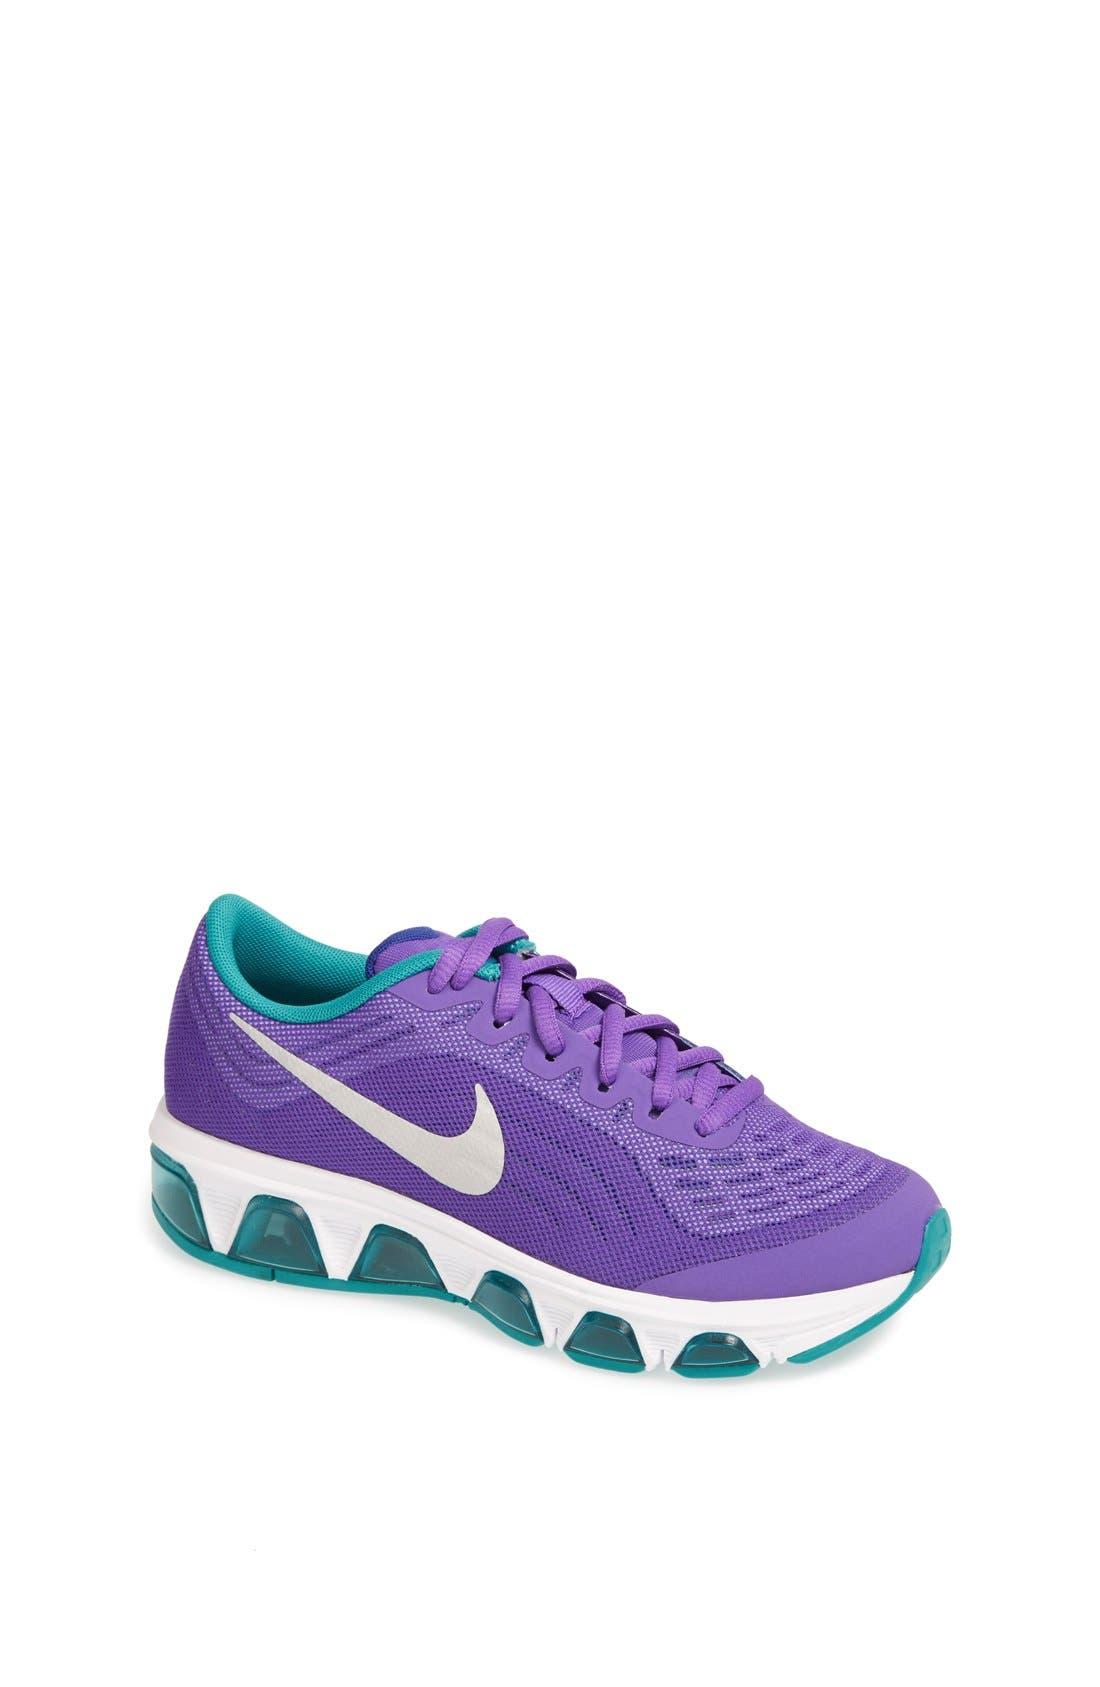 Main Image - Nike 'Air Max Tailwind+' Running Shoe (Big Kid)